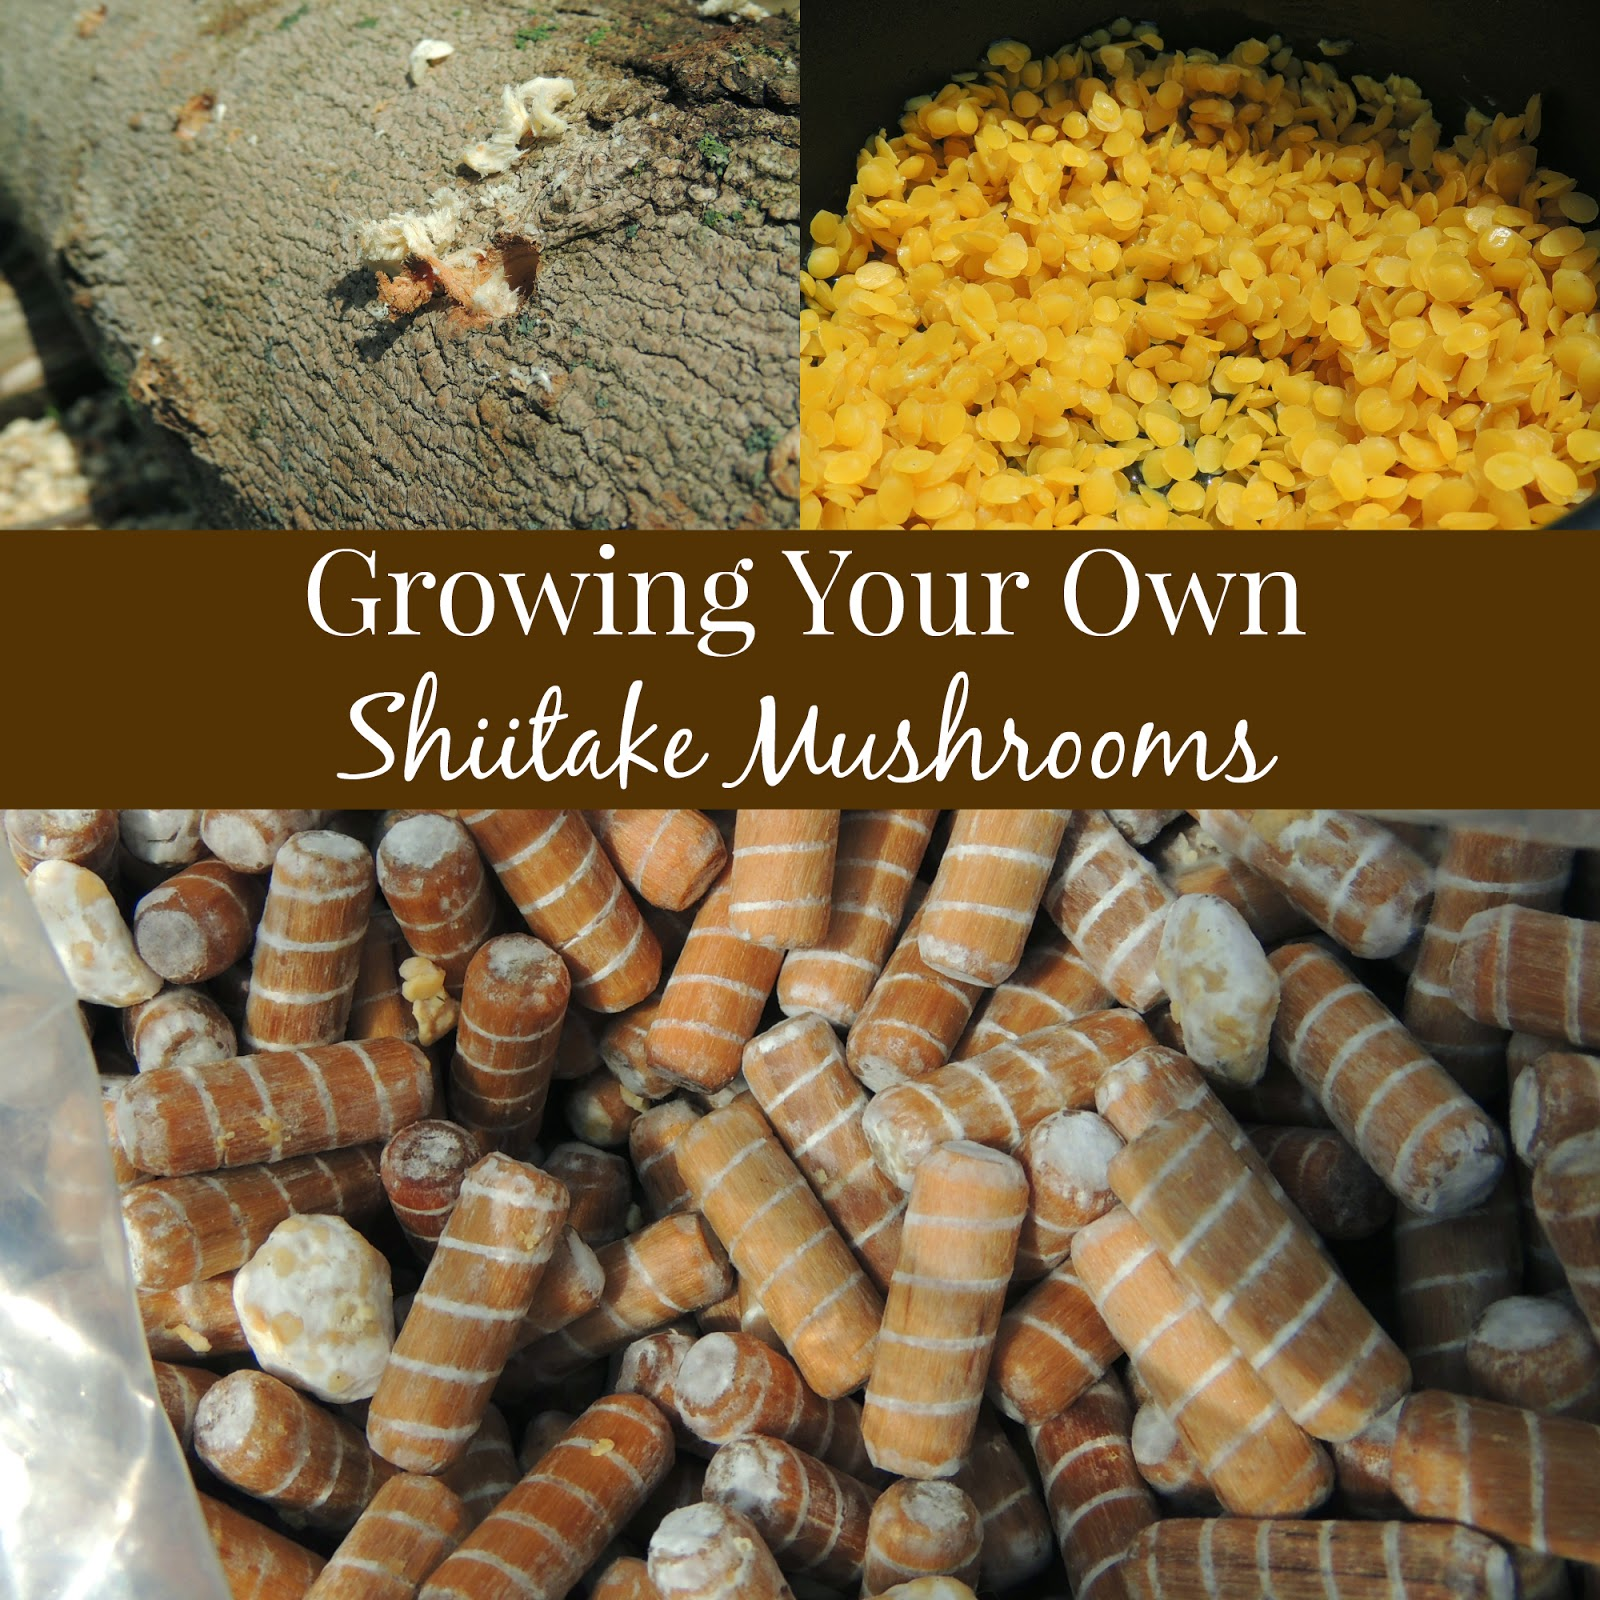 linn acres farm growing your own shiitake mushrooms